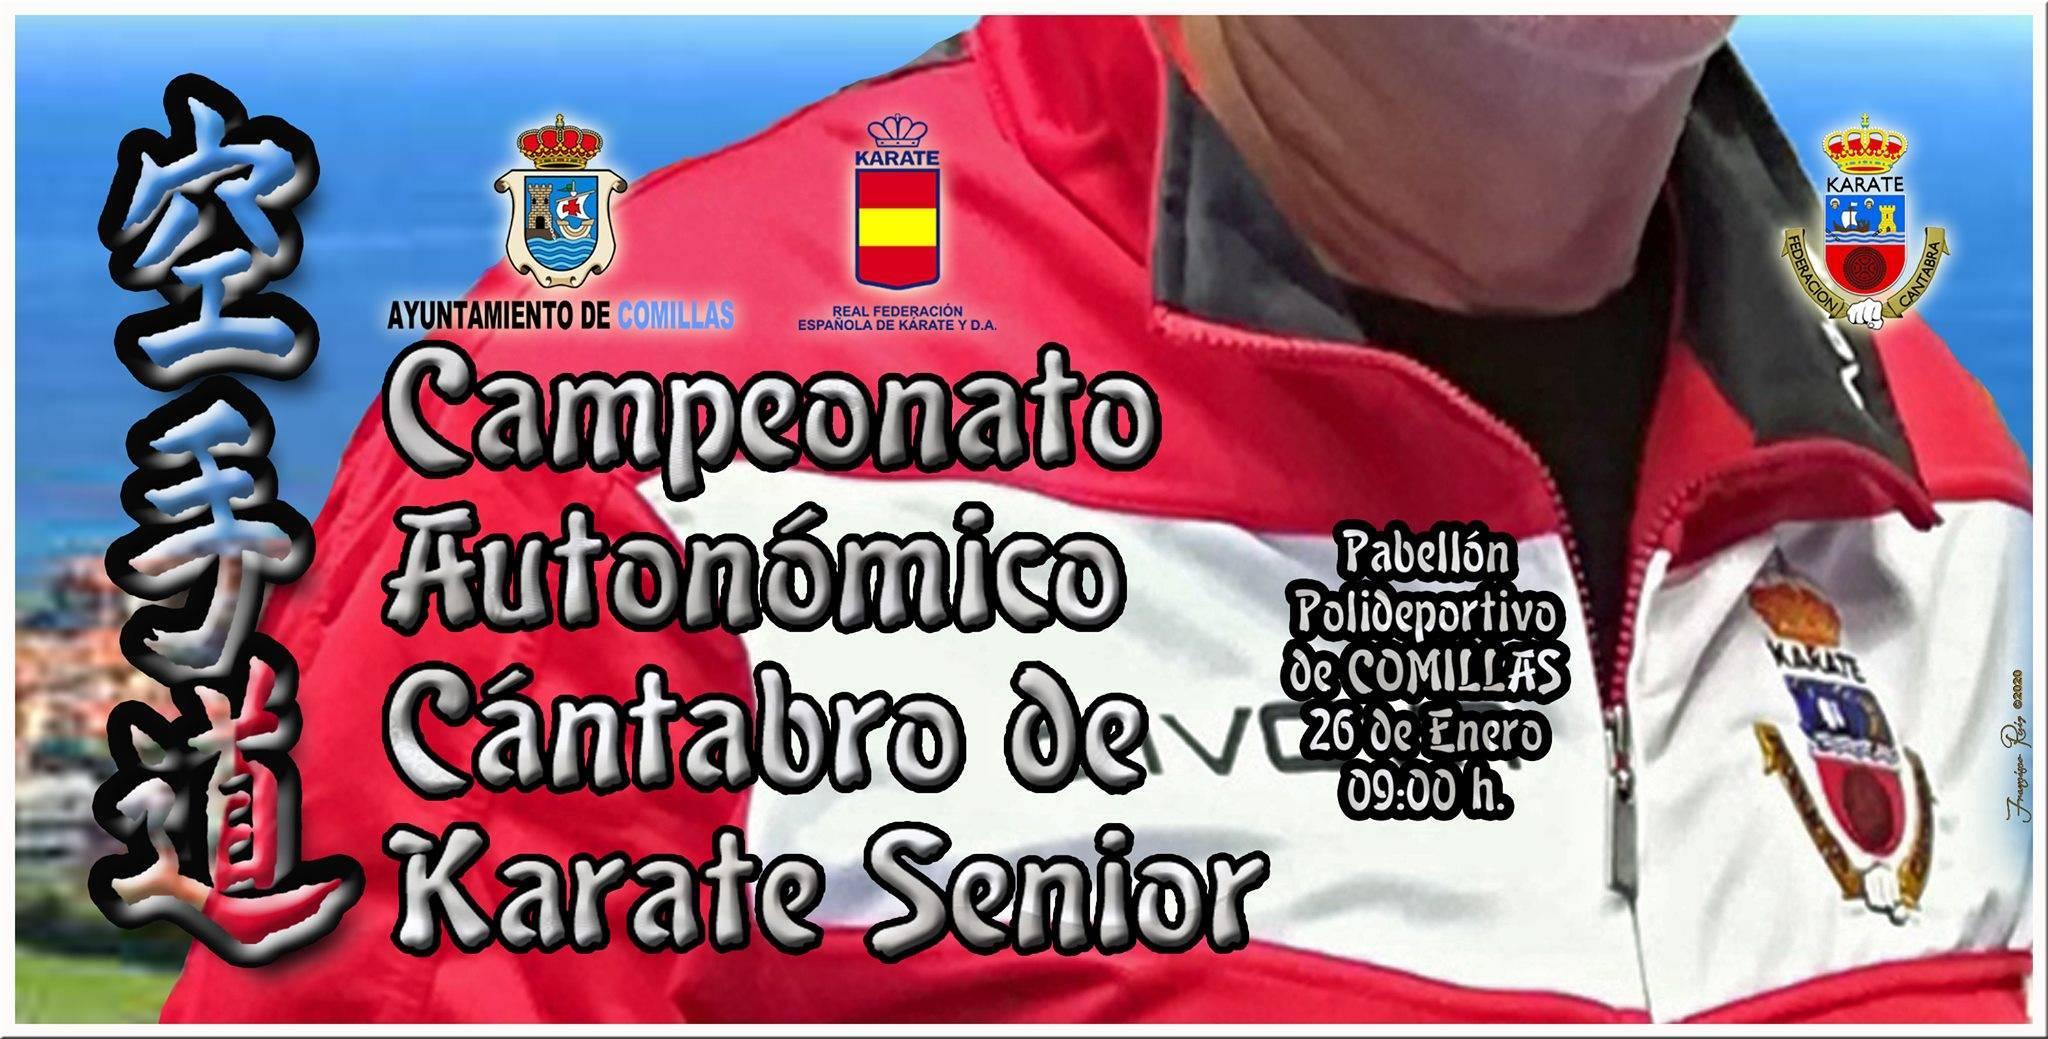 Campeonato autonómico cántabro de kárate senior 2020 - Comillas (Cantabria)